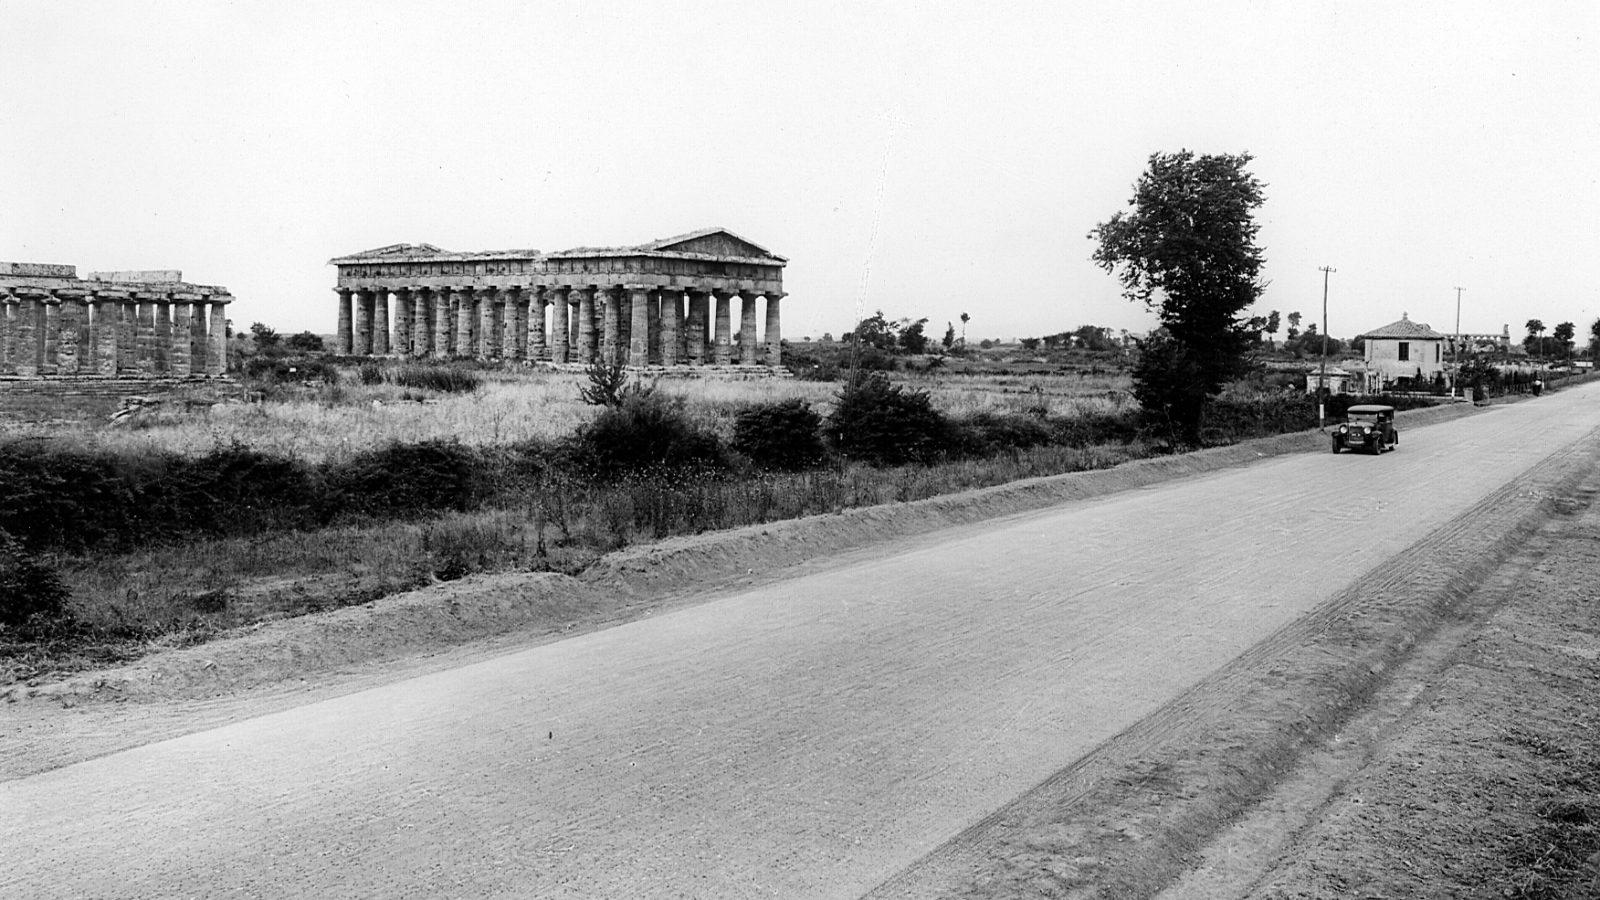 Campania, strada statale 18 a Paestum, 1931 (Archivio storico Anas)